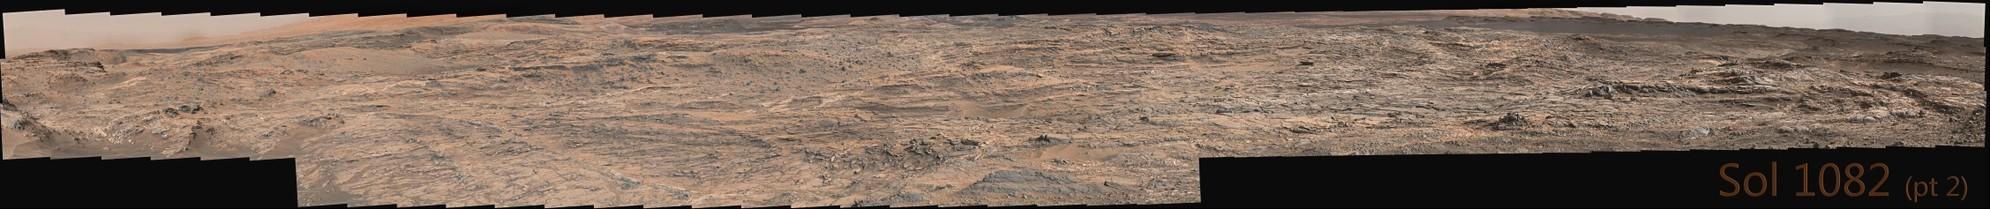 MSLCuriosity Rover Sol 1082 pt2